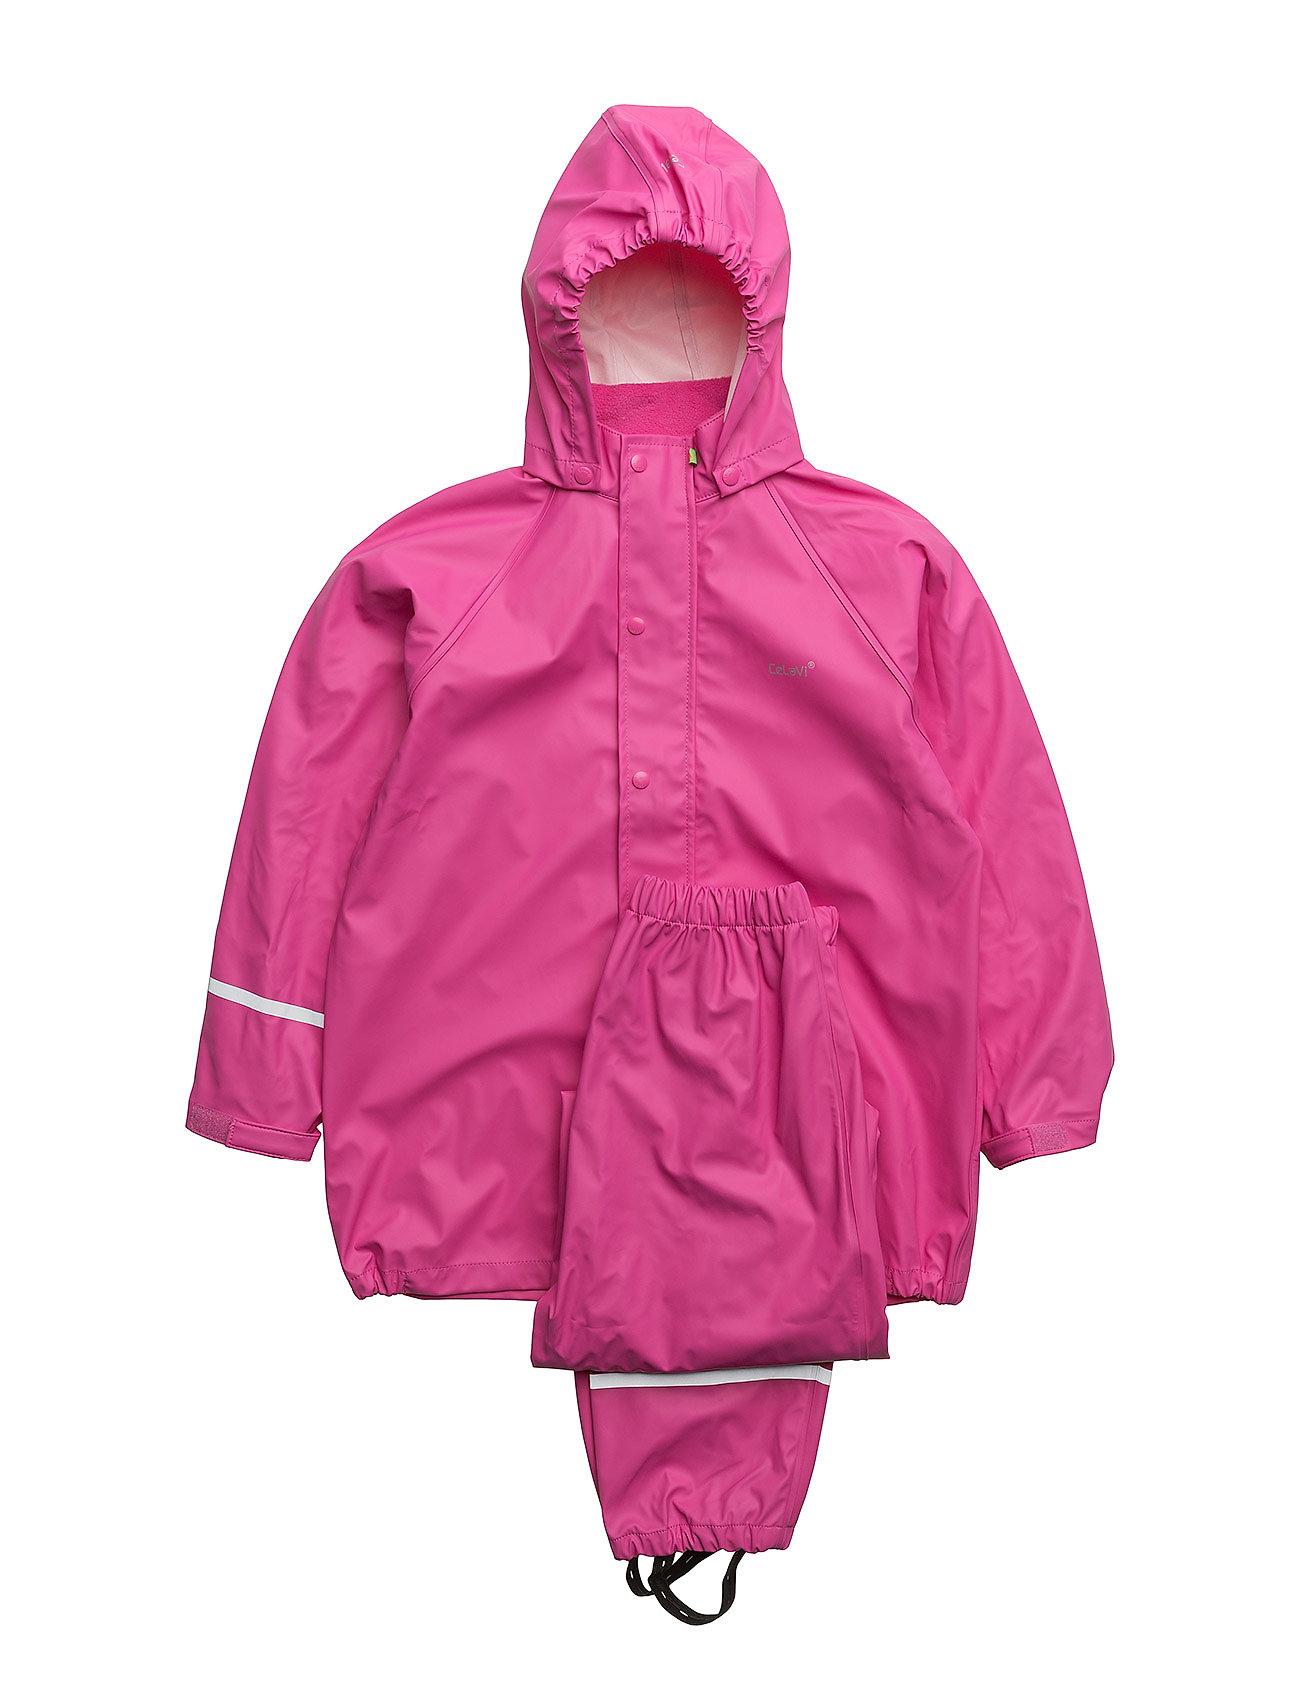 Image of Basci Rainwear Set, Solid Regntøj Lyserød CeLaVi (3276044333)